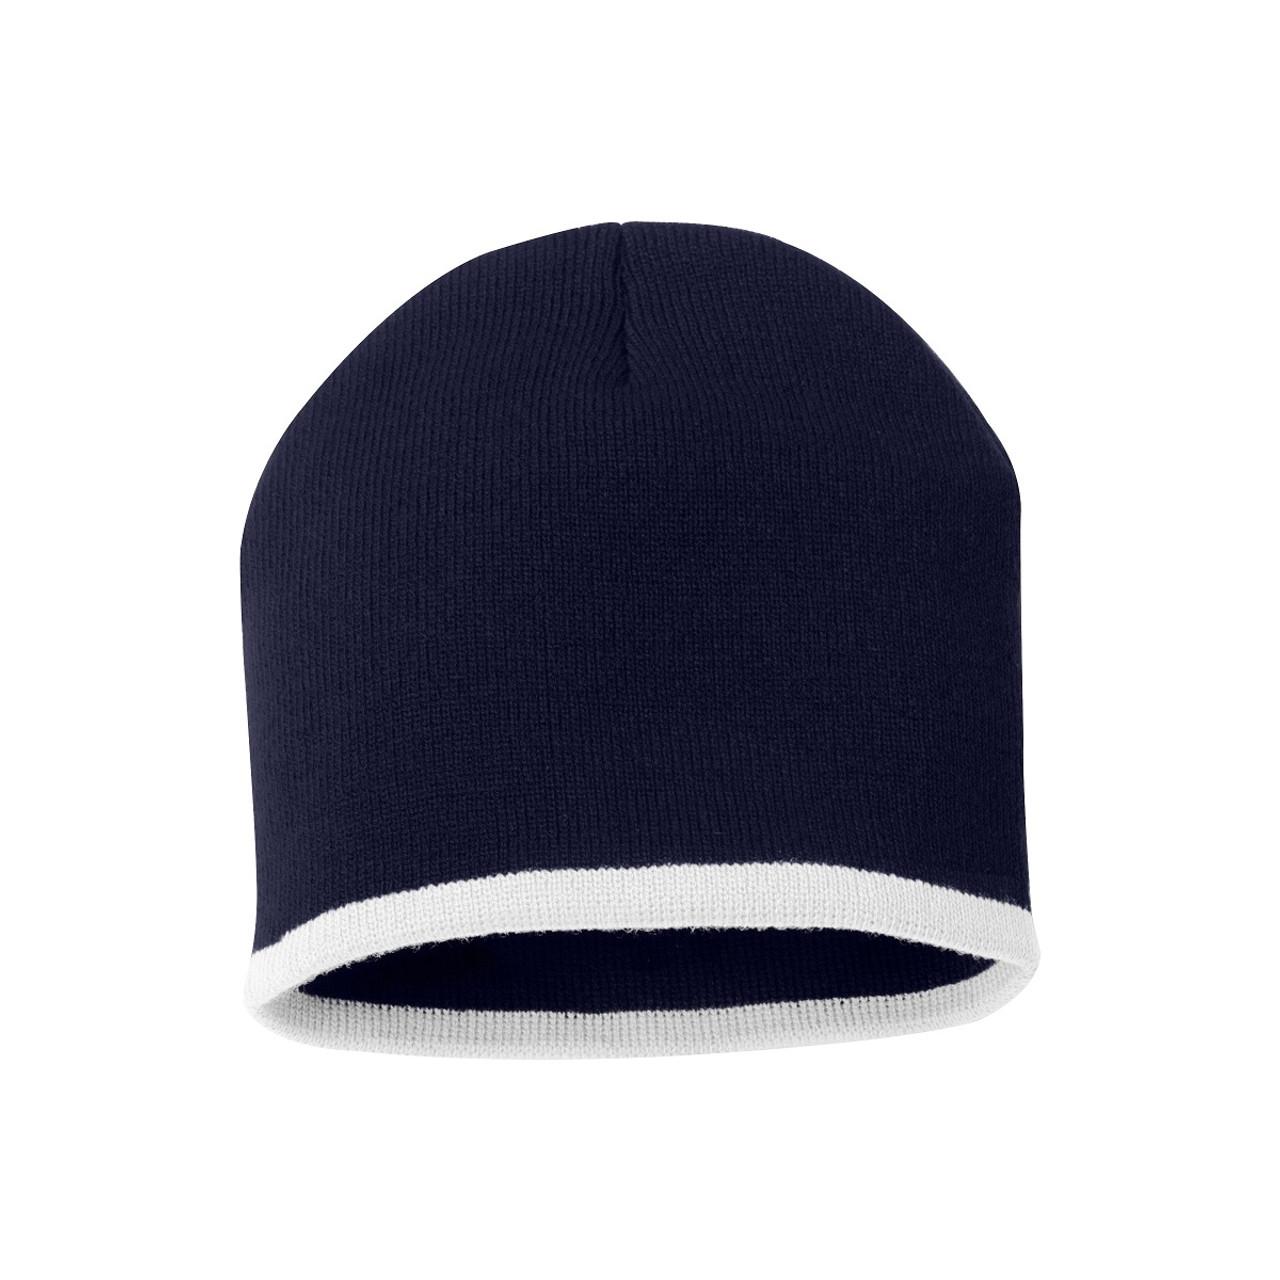 "Navy/White - SP09 Sportsman Bottom Stripe Acrylic Knit 8"" Toque | T-shirt.ca"